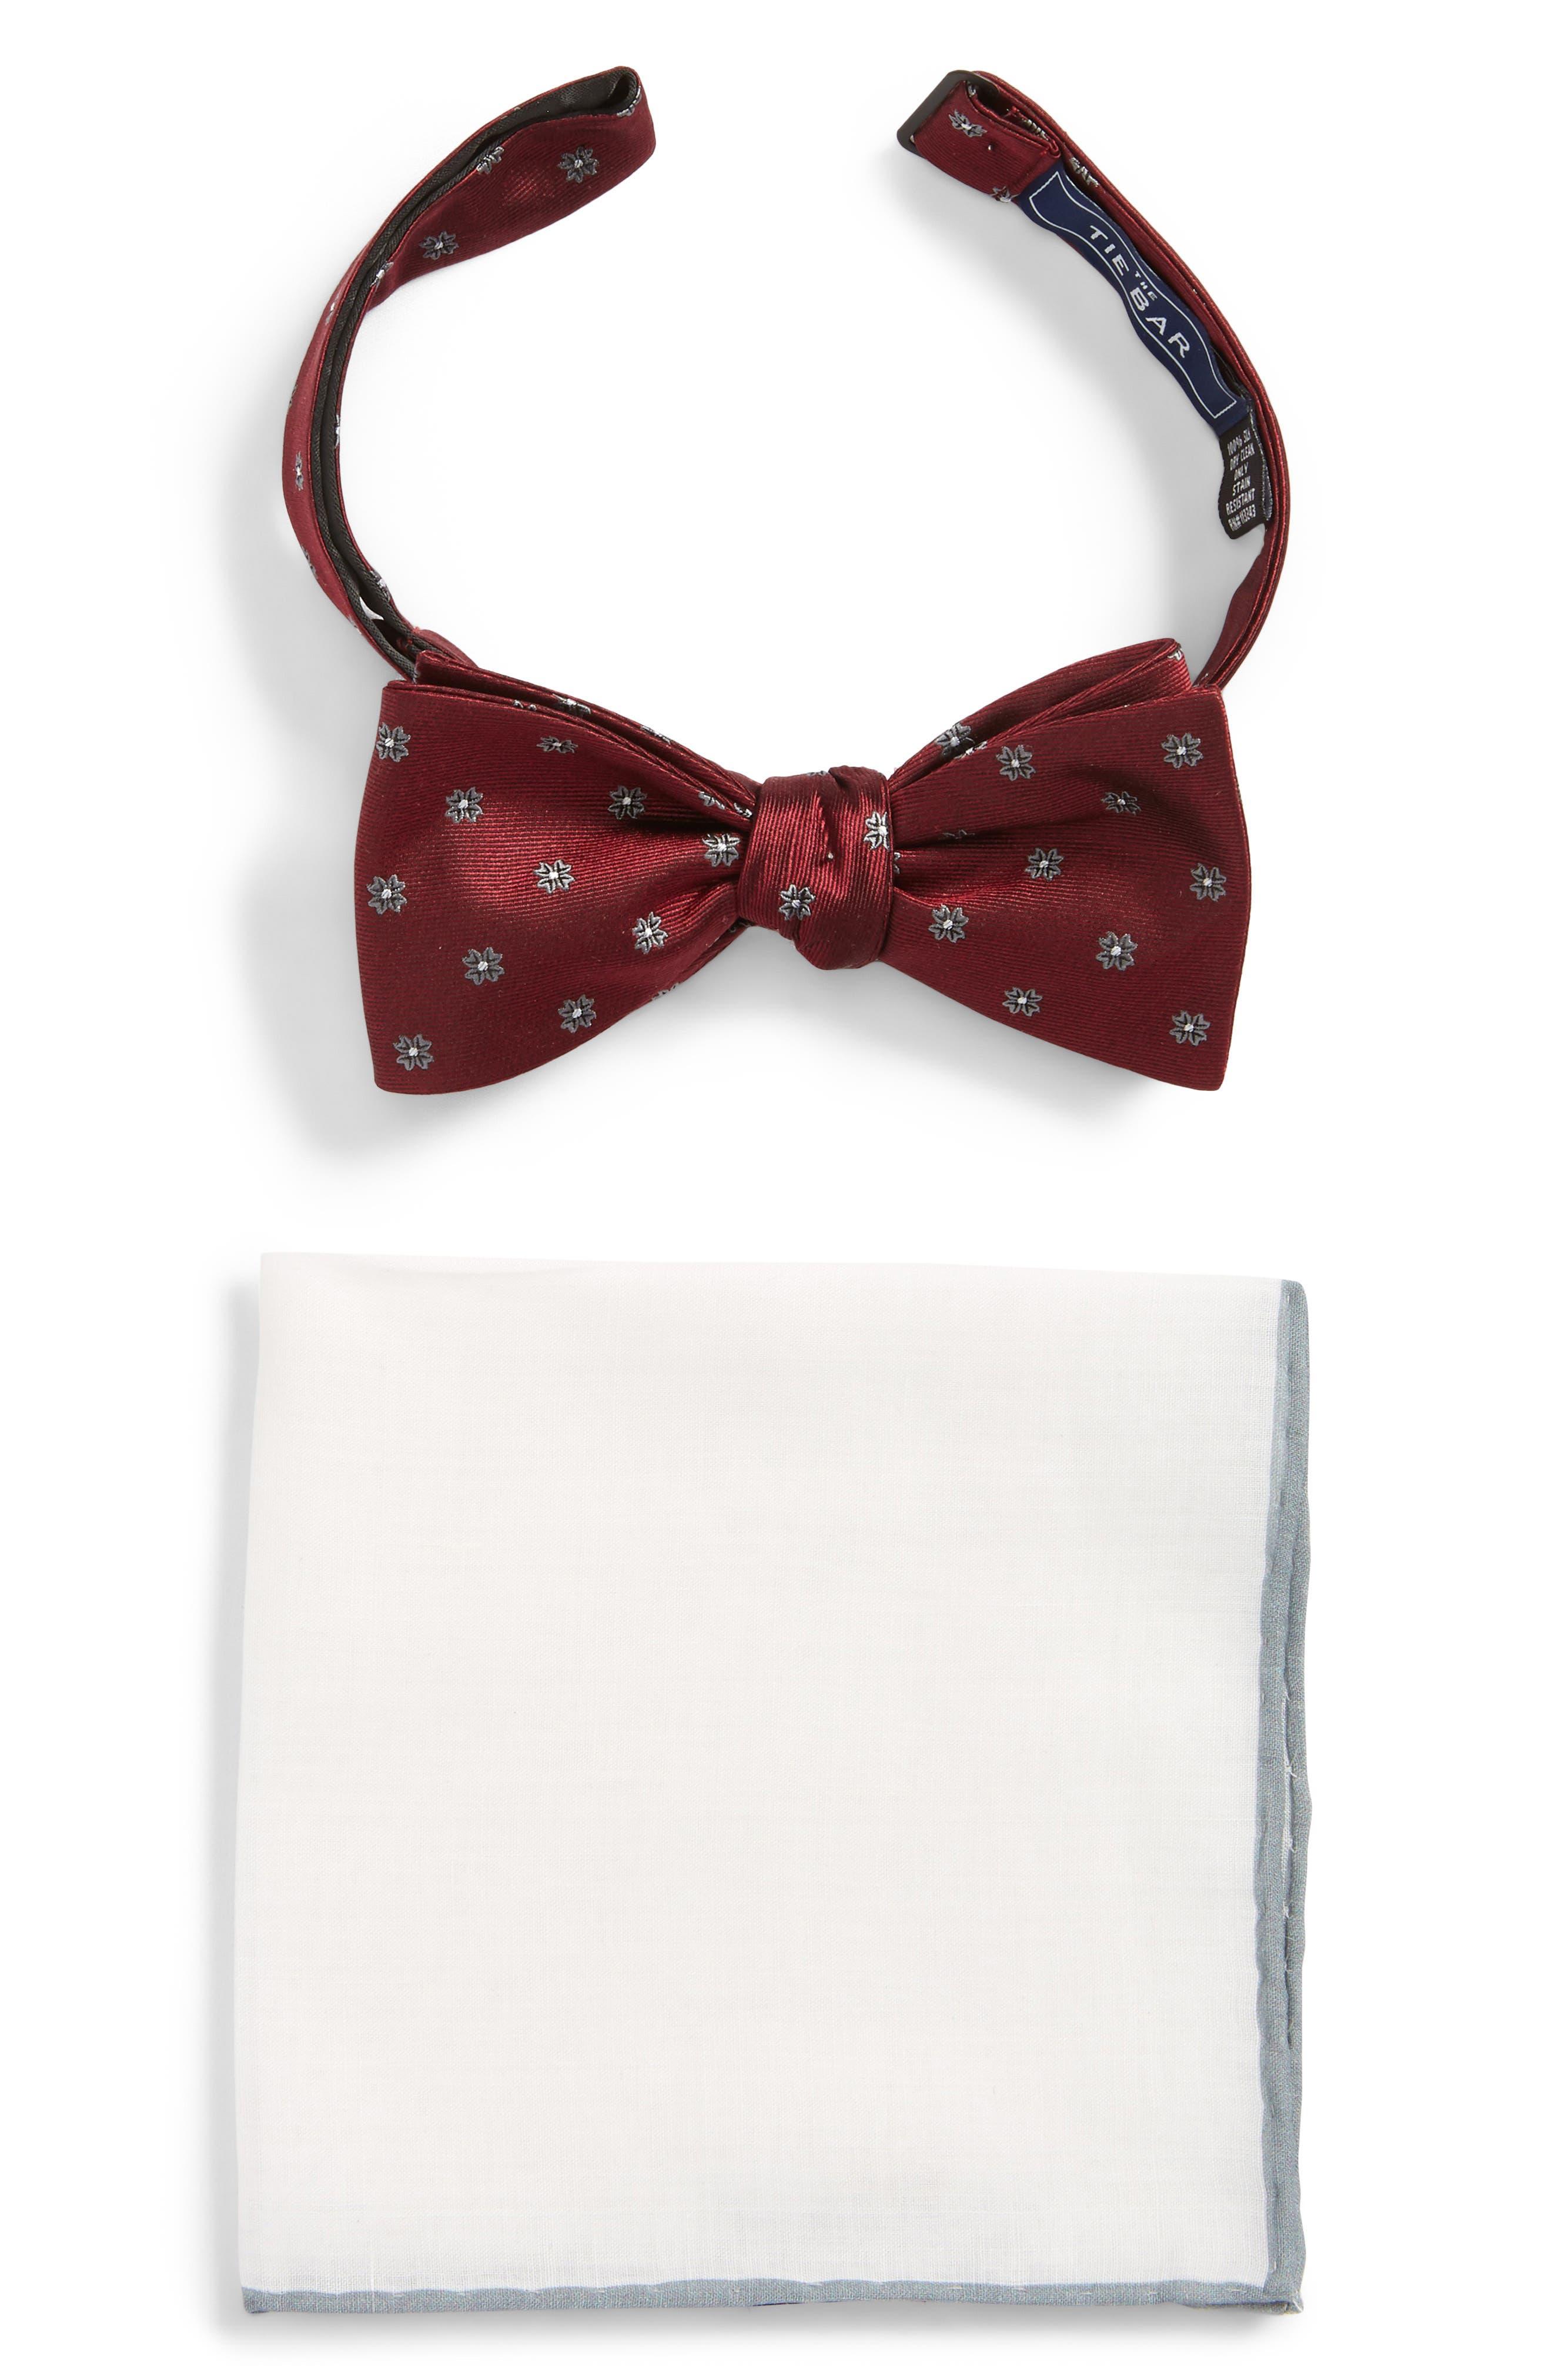 Main Image - The Tie Bar Bow Tie & Pocket Square Box Set